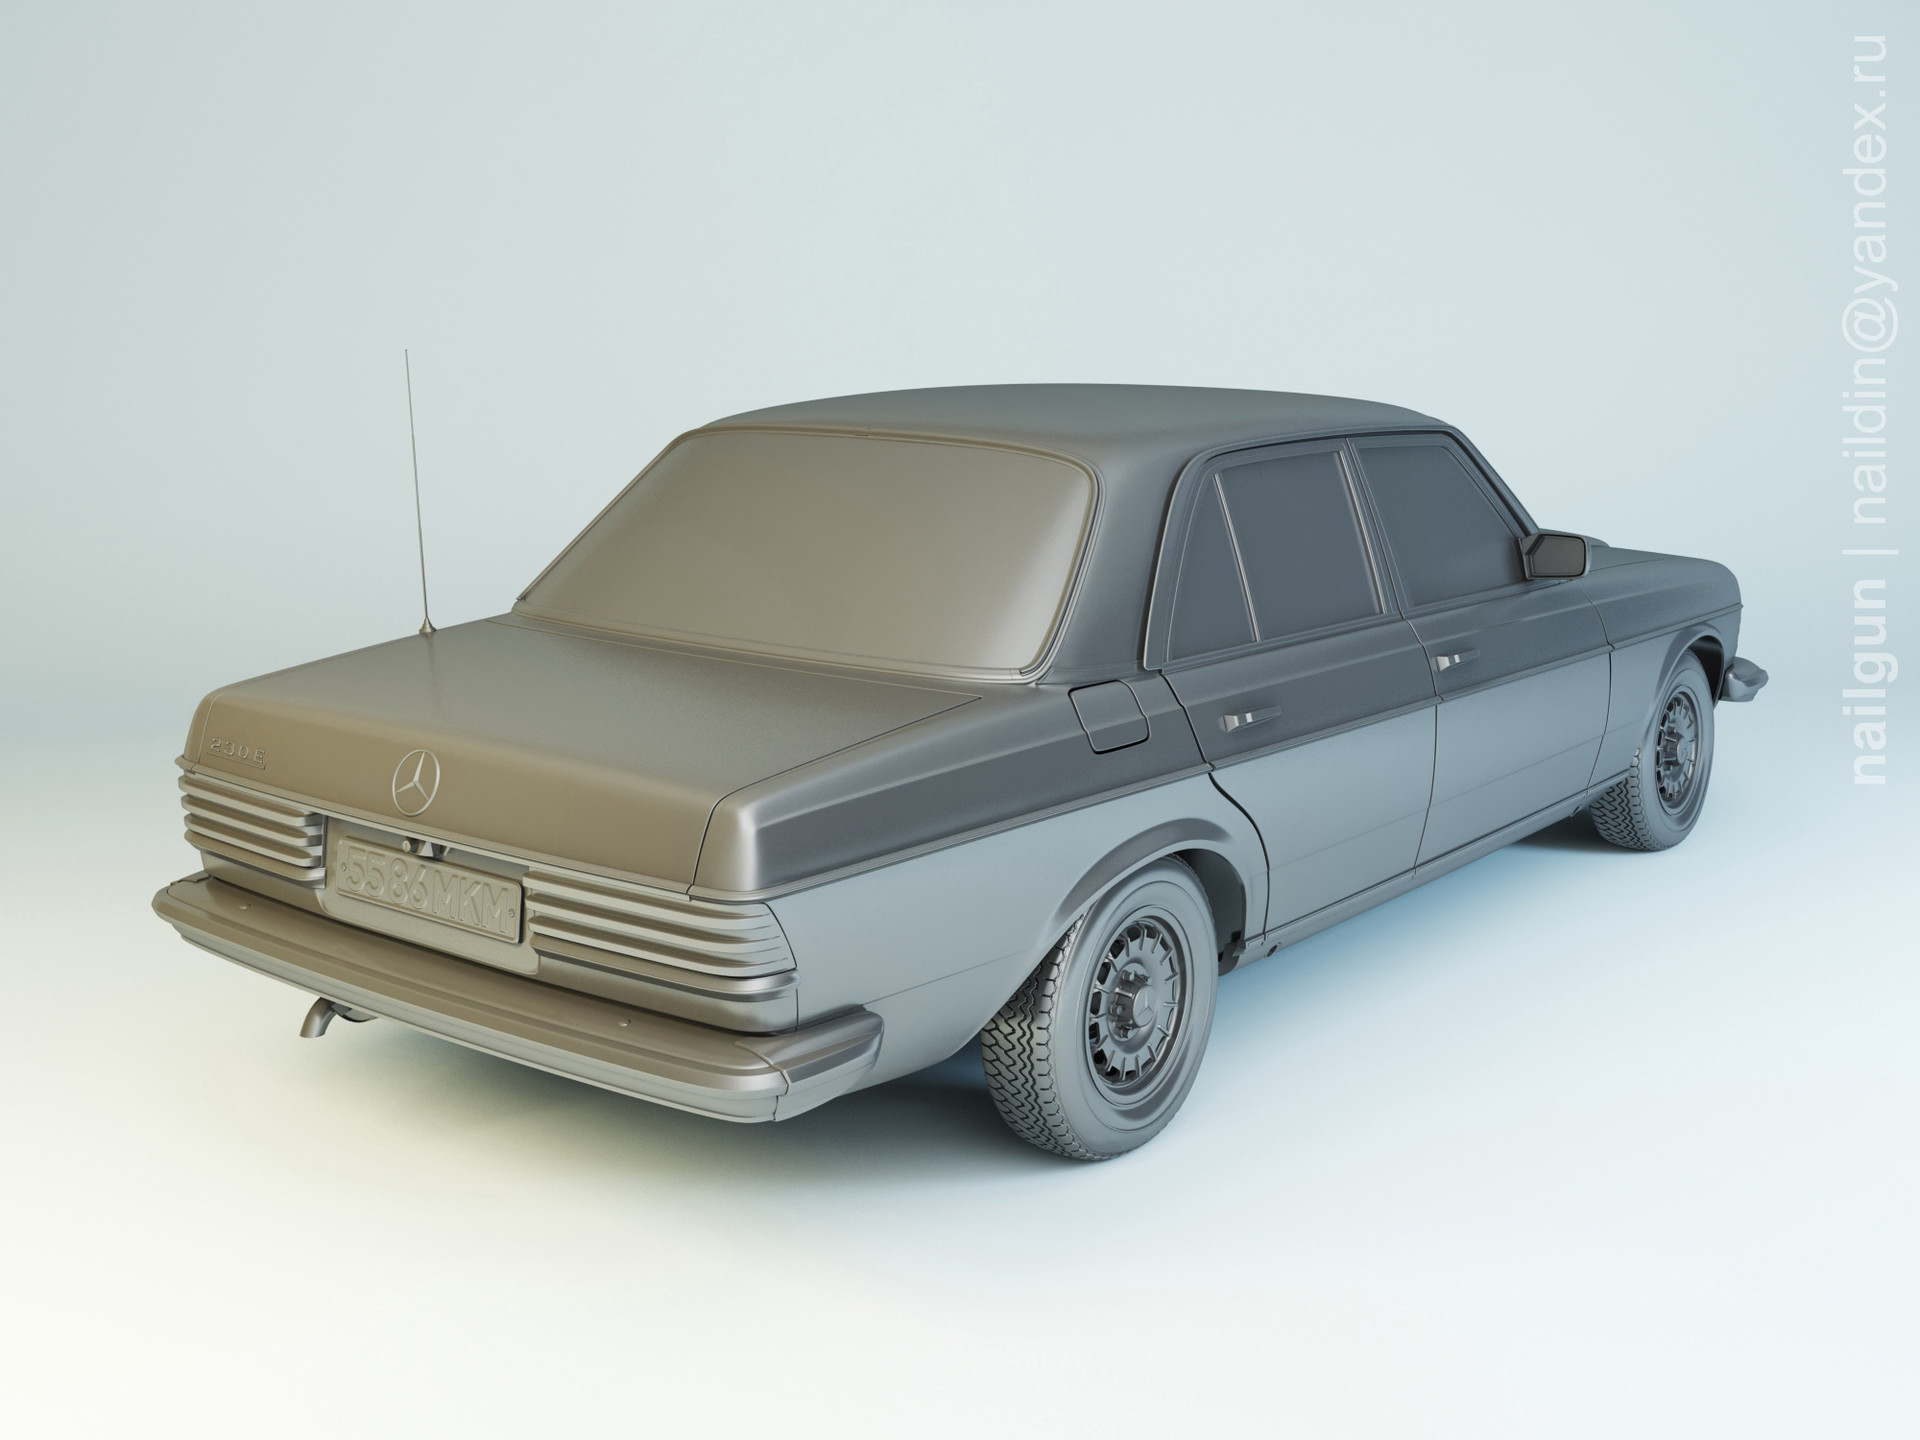 Nail khusnutdinov pwc 059 003 mercedes w123 modelling 1